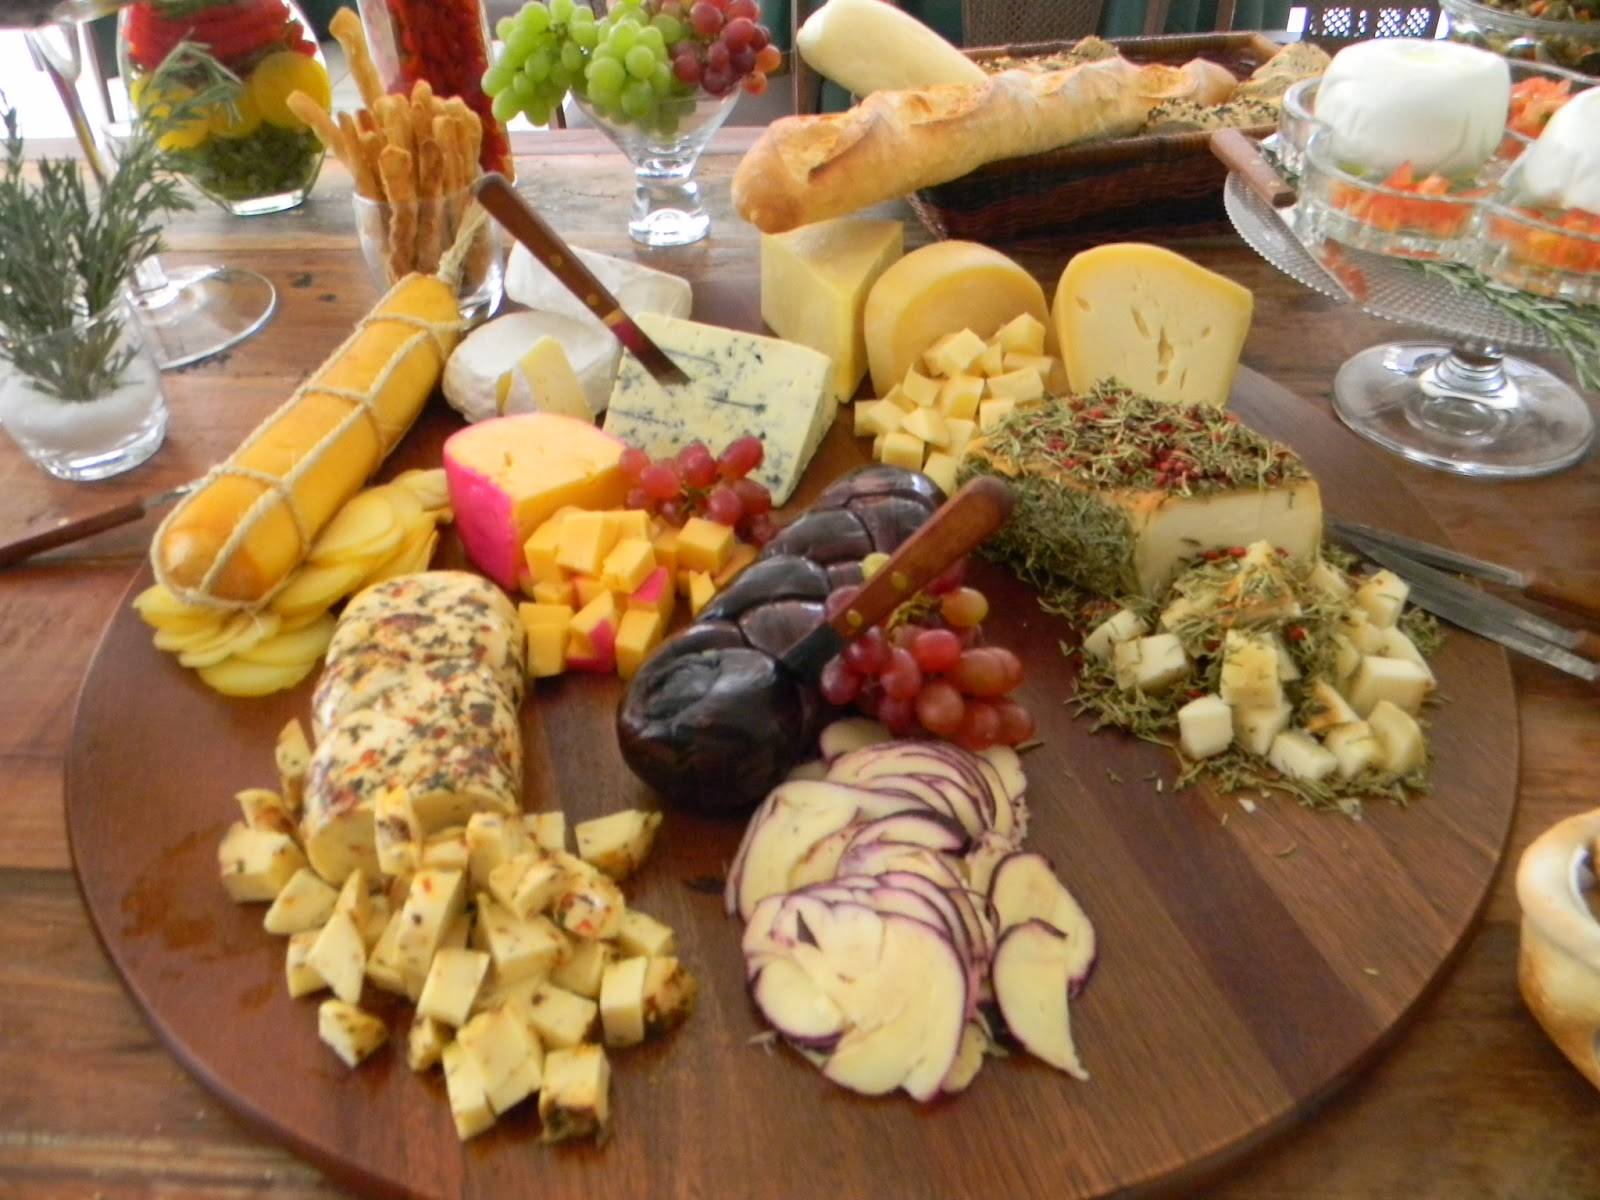 Festa queijo  vinhos  Segredos da Vov  Segredos da Vov